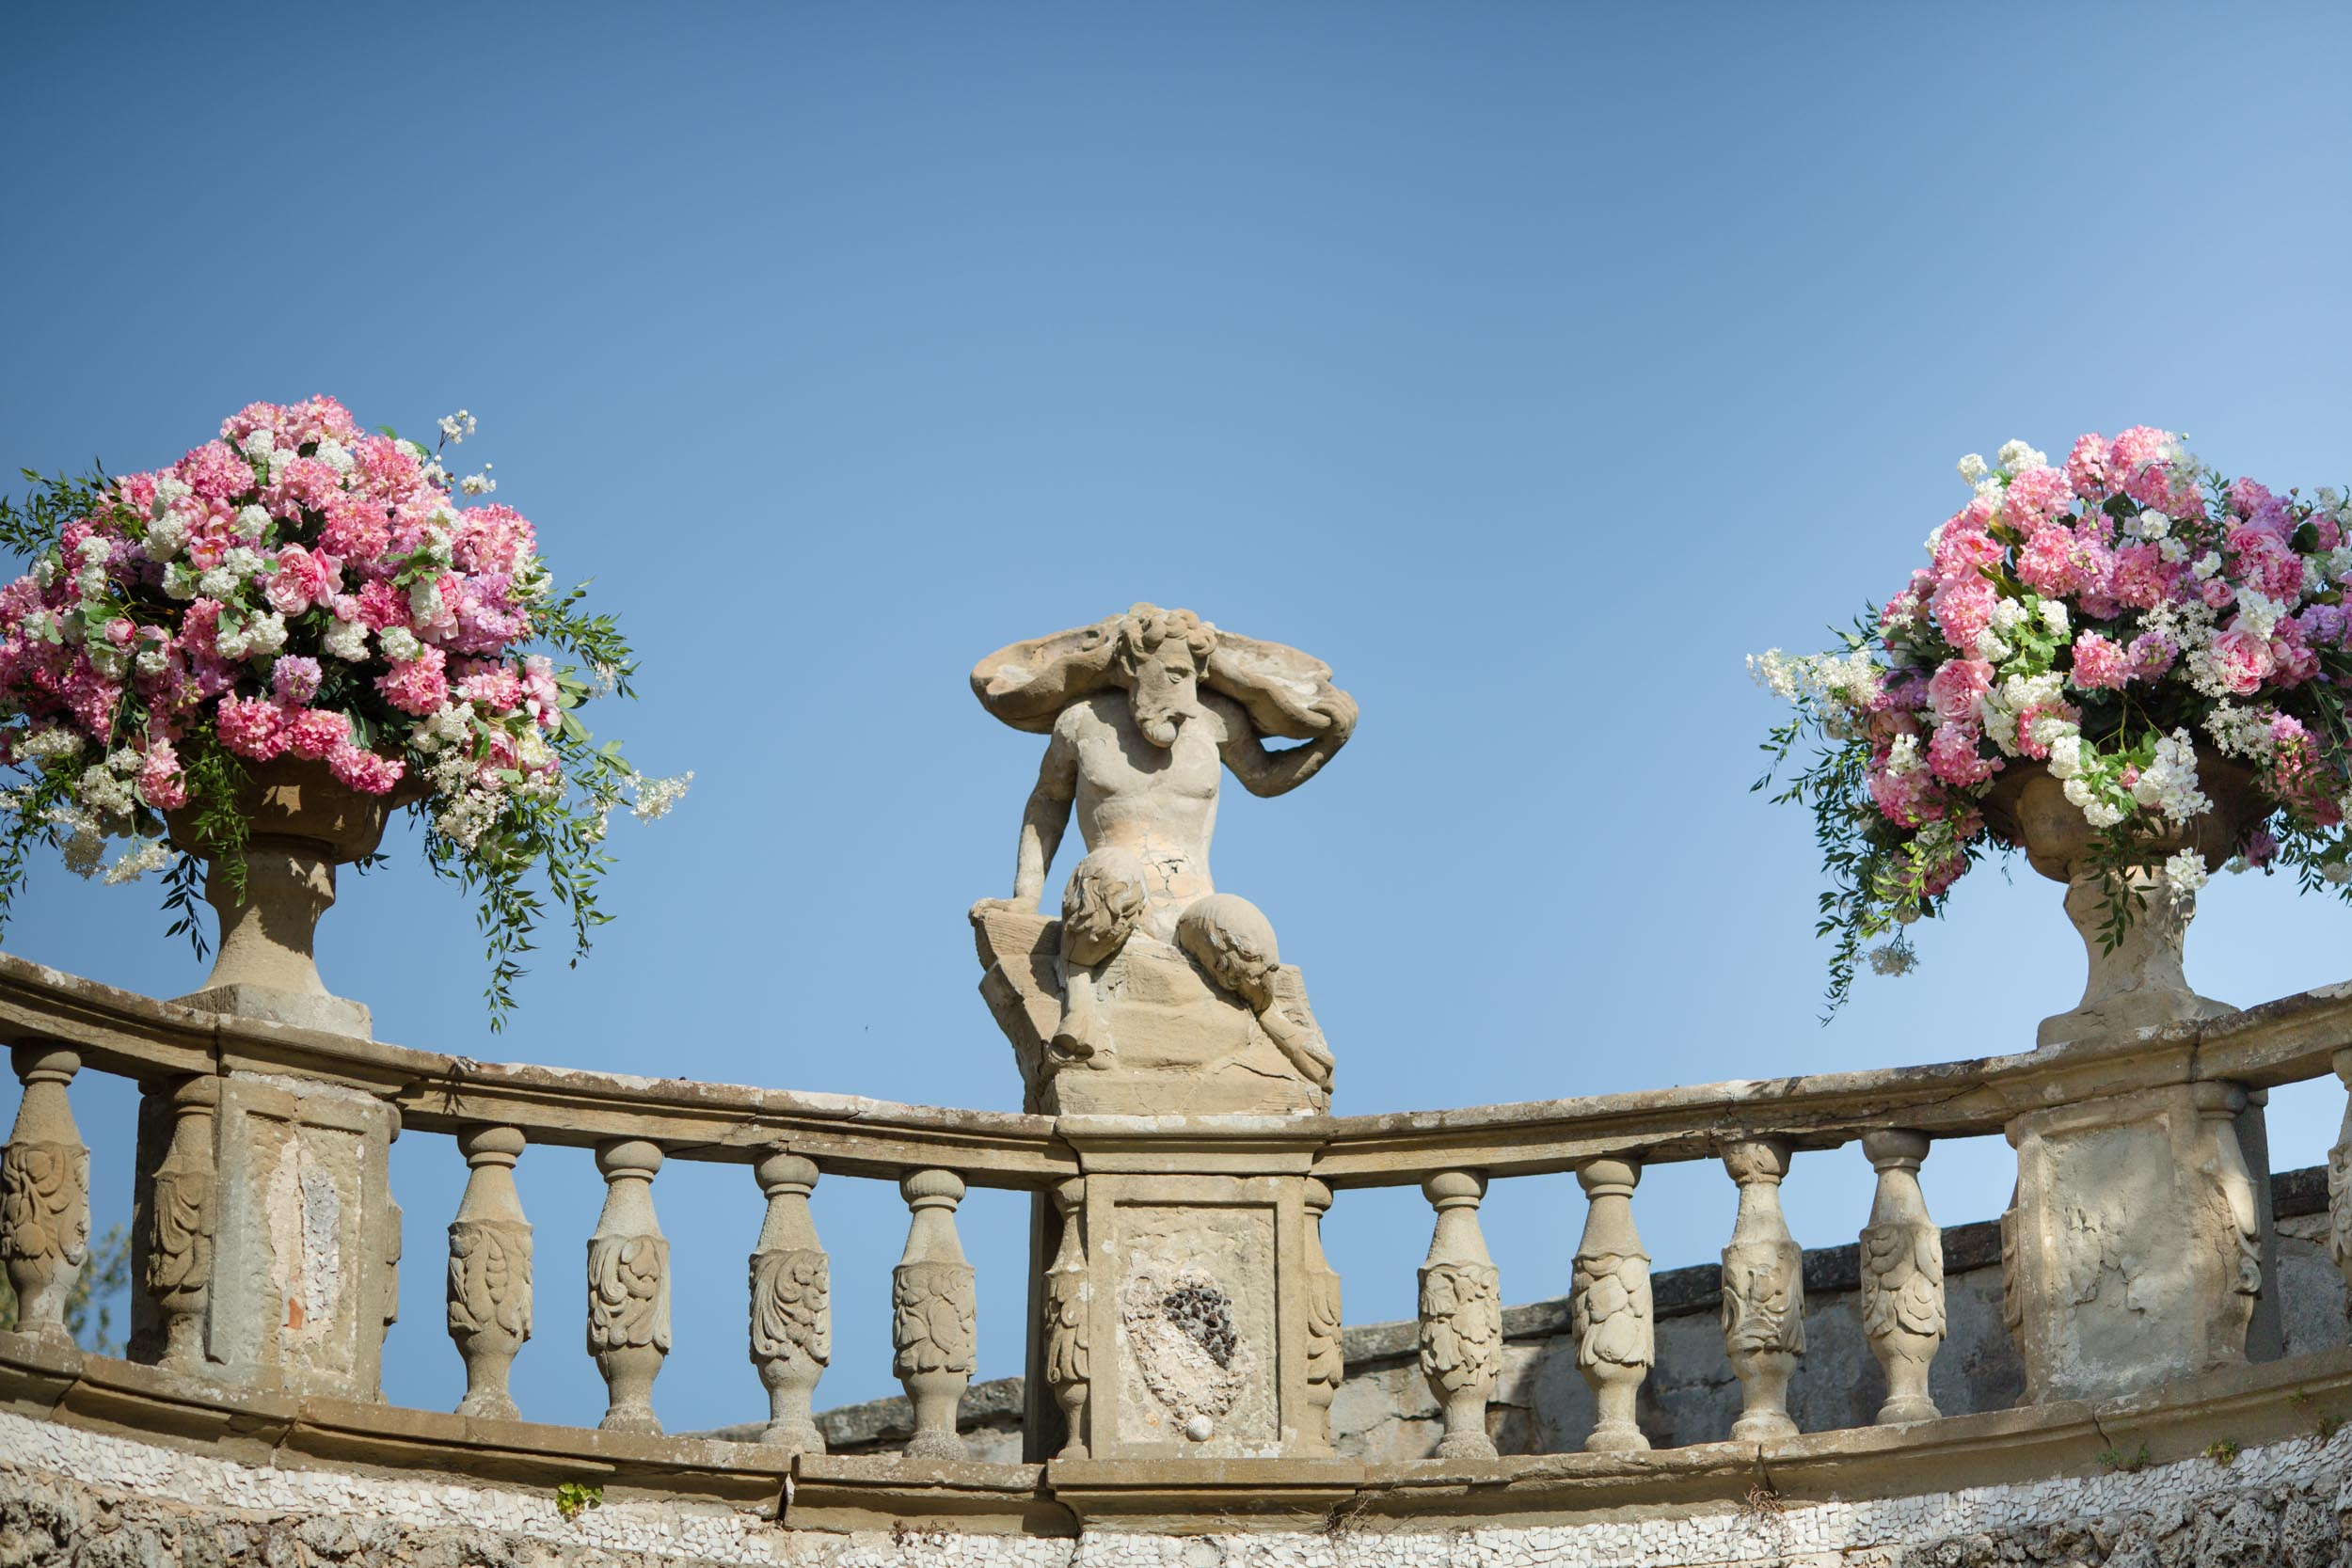 villa-gamberaia-florence-italy-destination-wedding-37.jpg